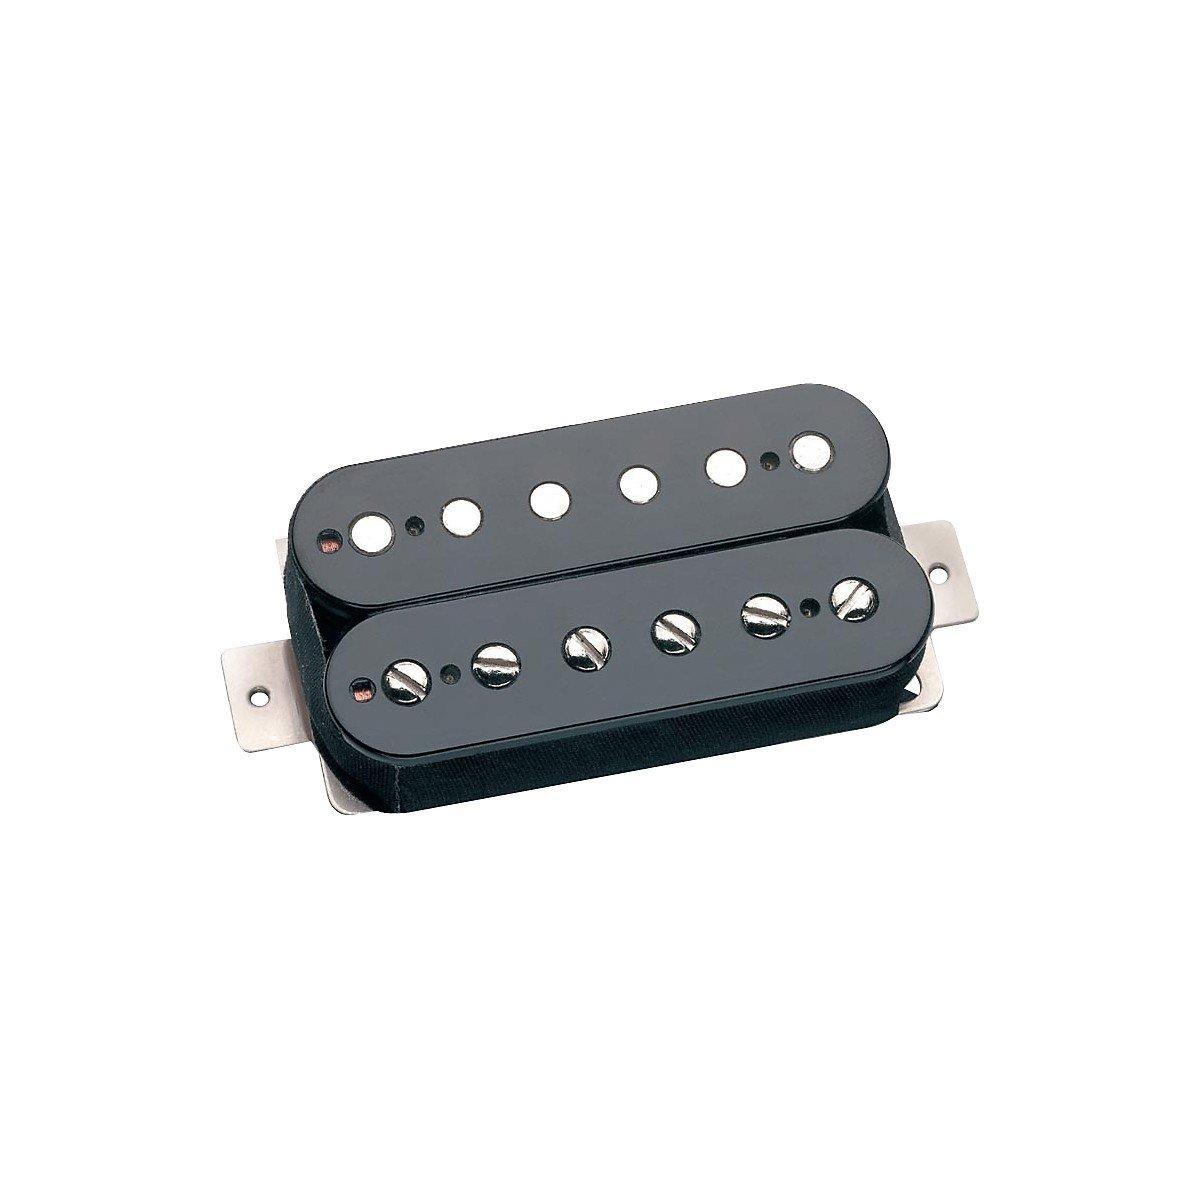 Seymour Duncan APH-2n Alnico II Pro Slash Humbucker Electric Guitar Neck Pickup Black